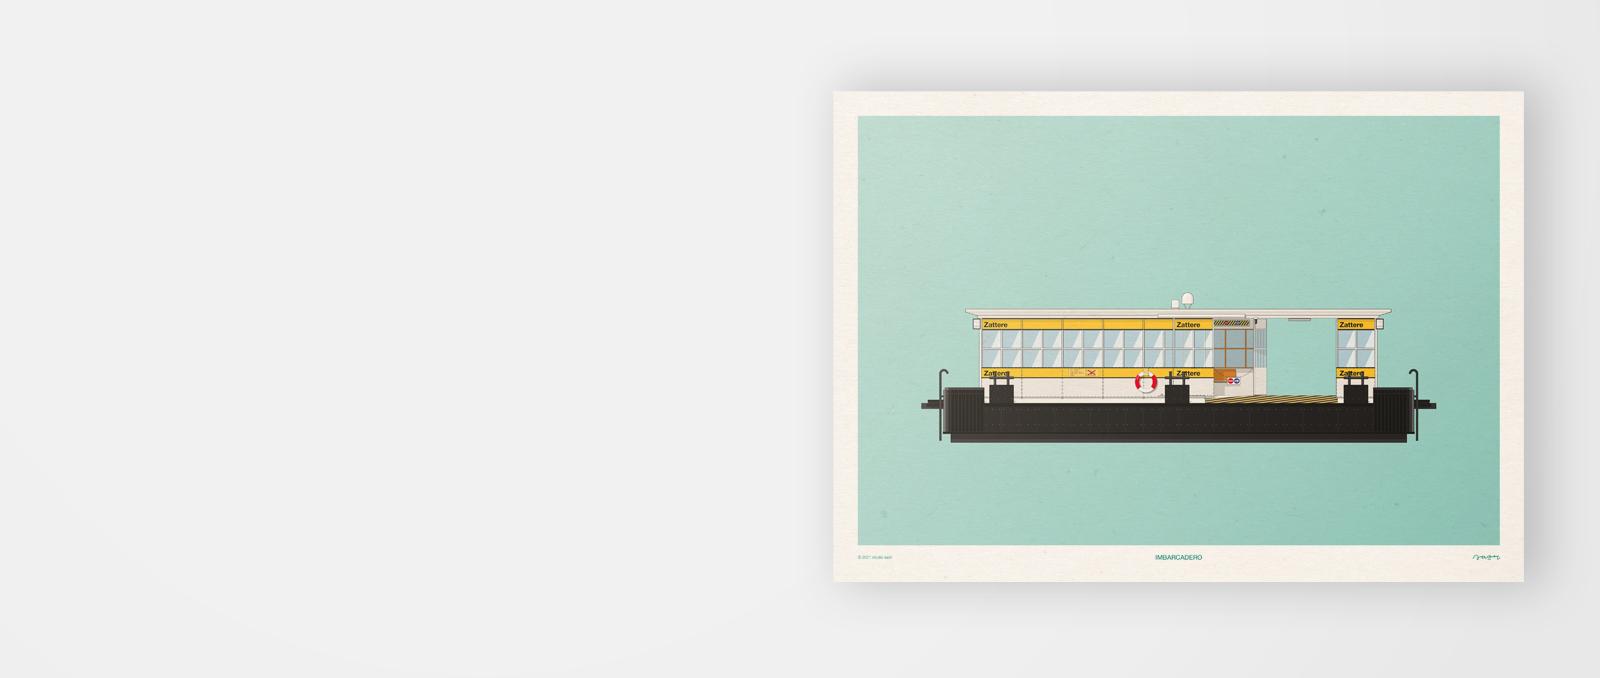 imbarcadero-banner-desktop-01